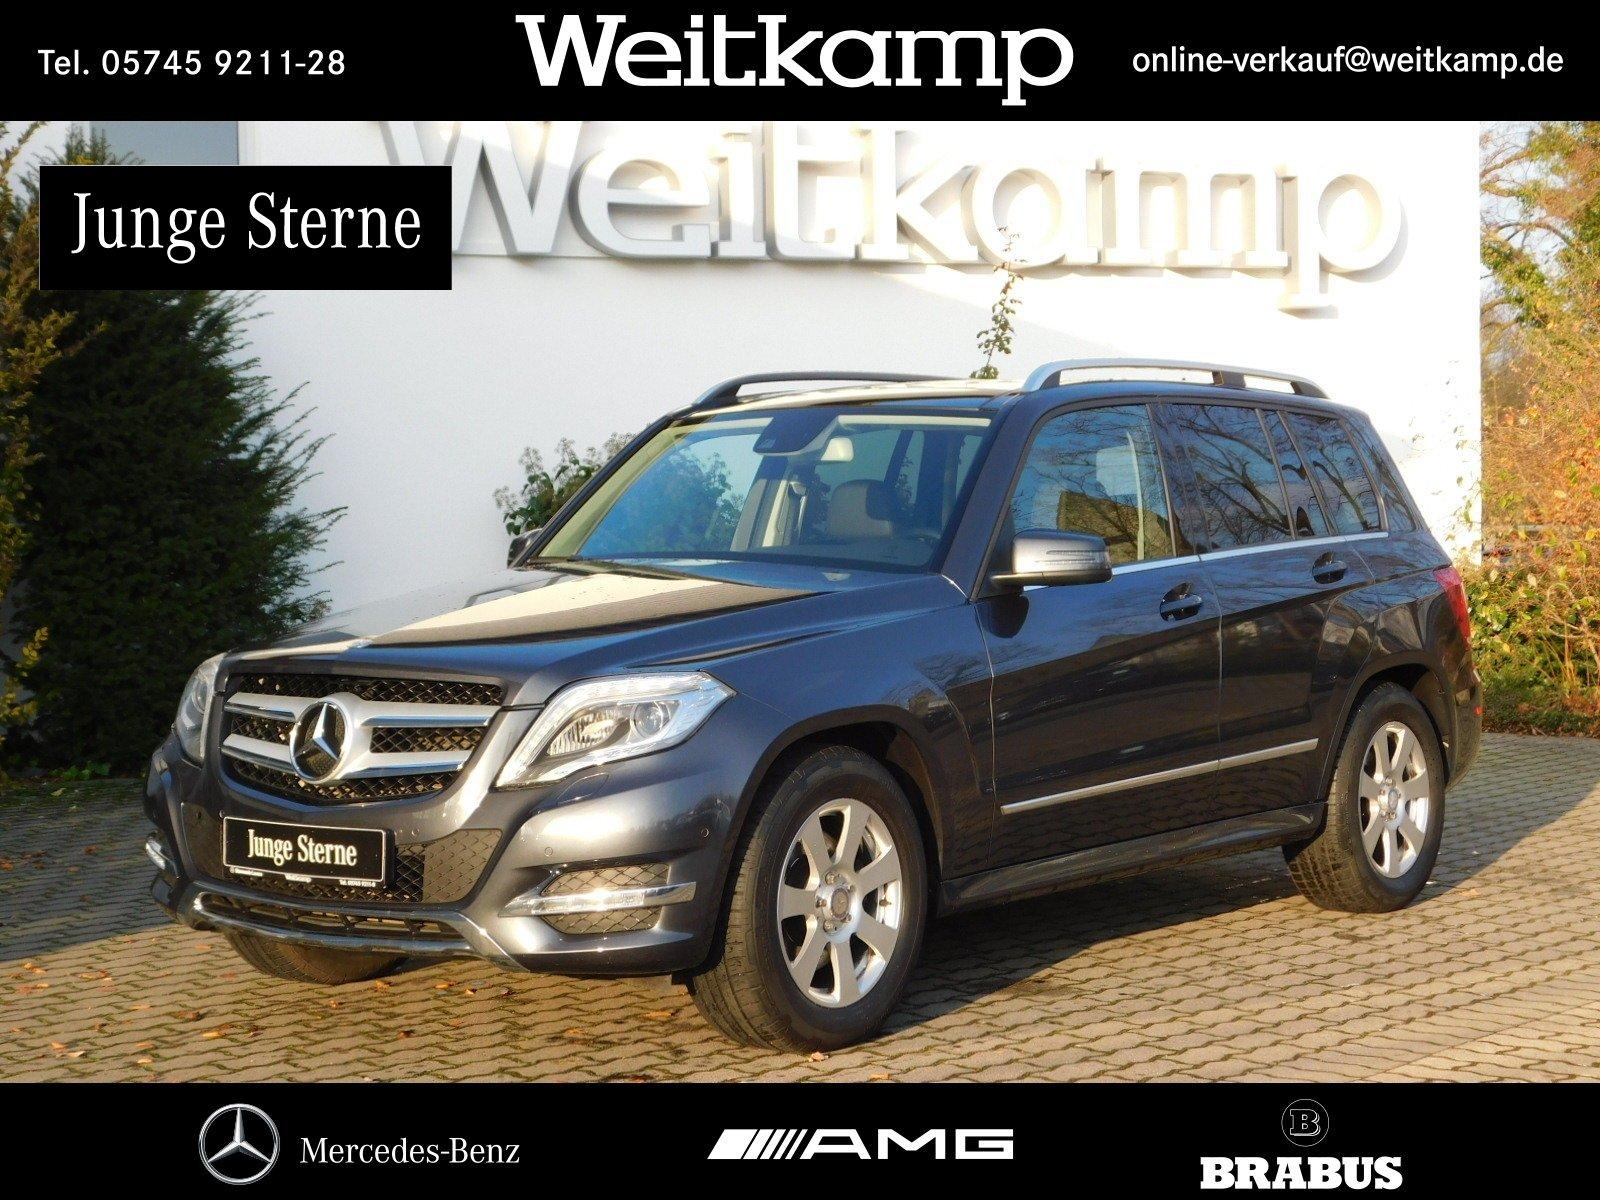 Mercedes-Benz GLK 350 CDI 4M Panorama+Xenon+Comand+Kamera+PTS, Jahr 2014, diesel